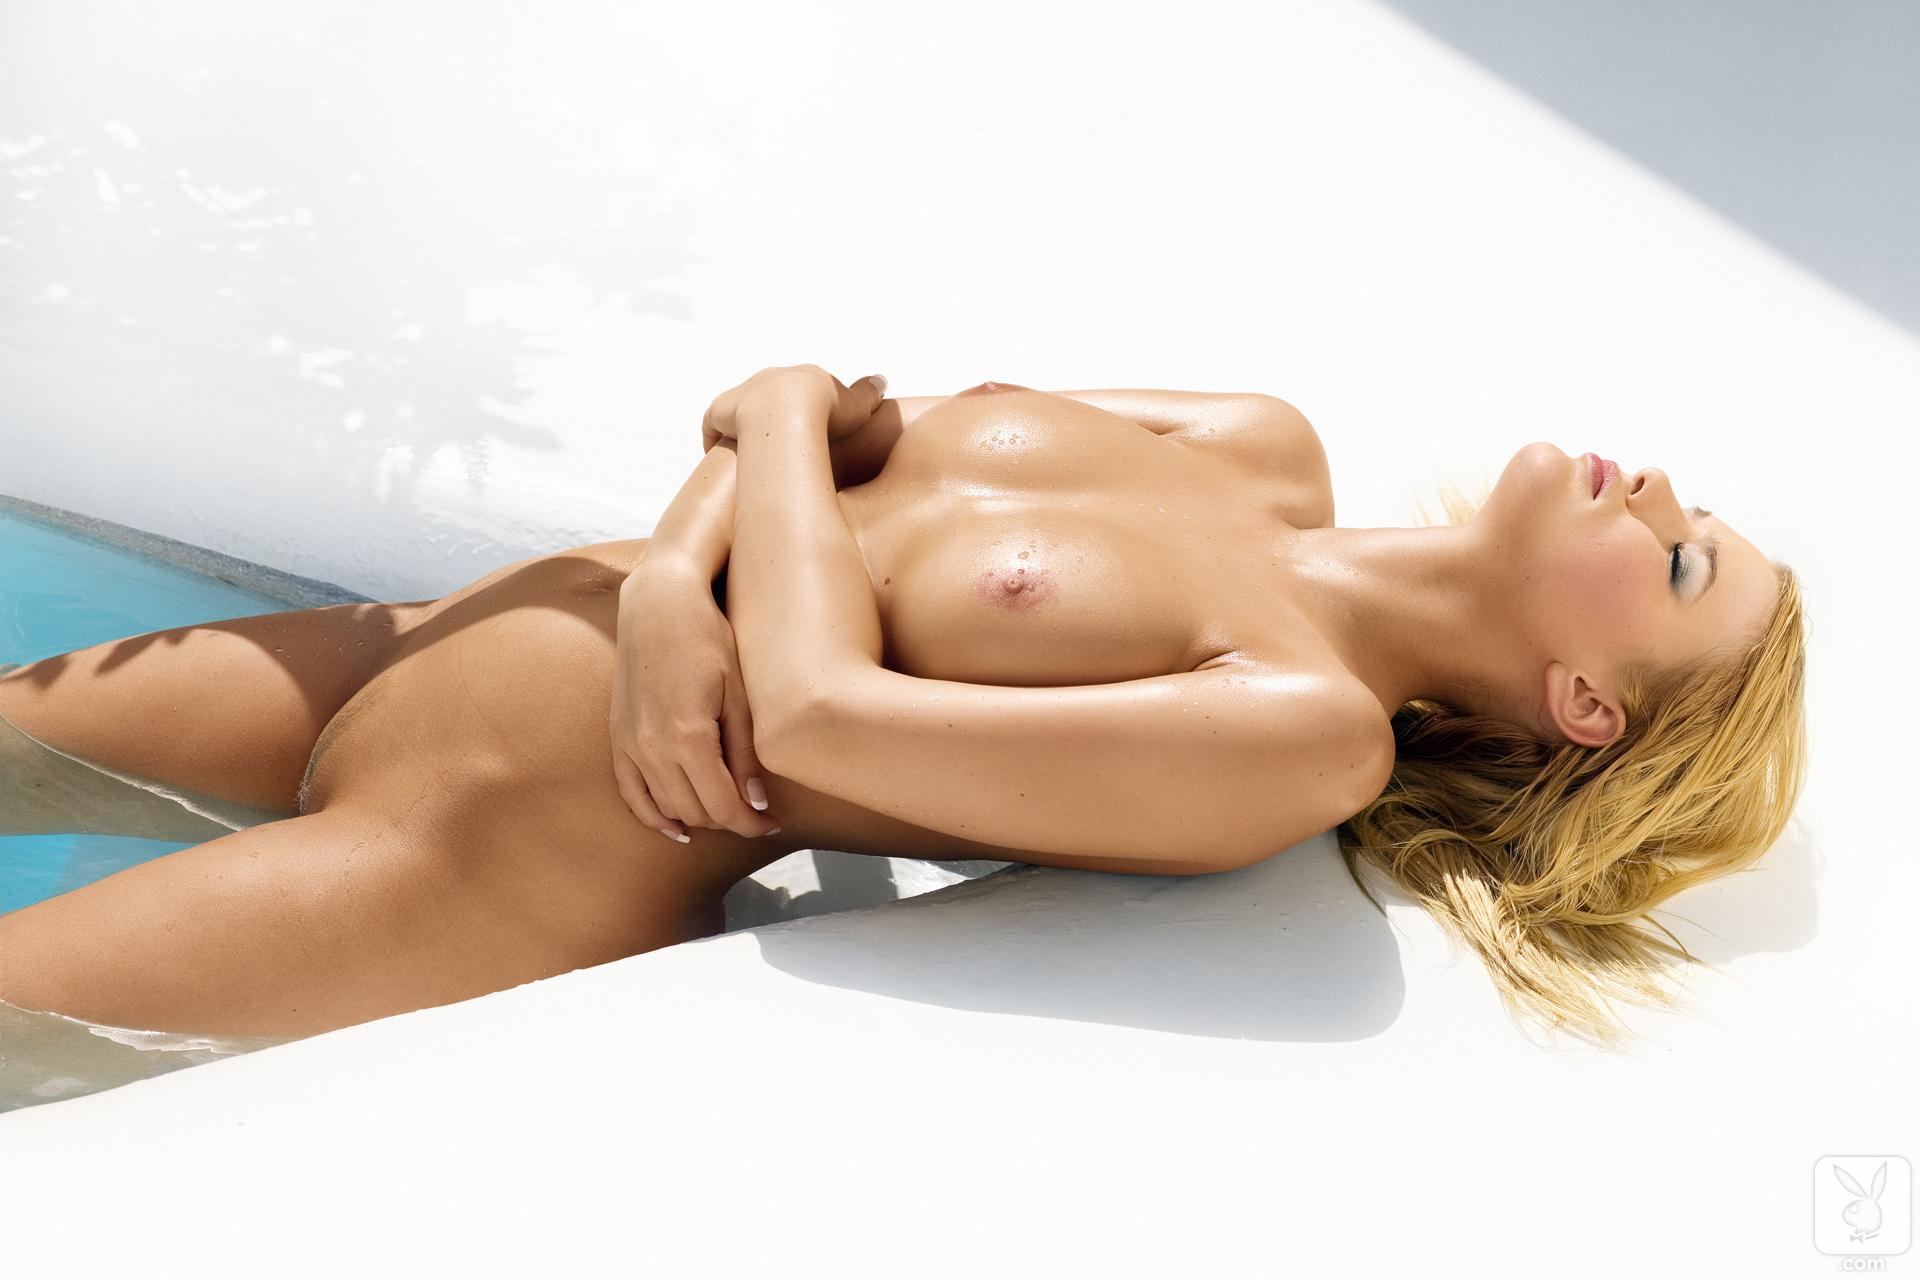 Nude playboy full body shot